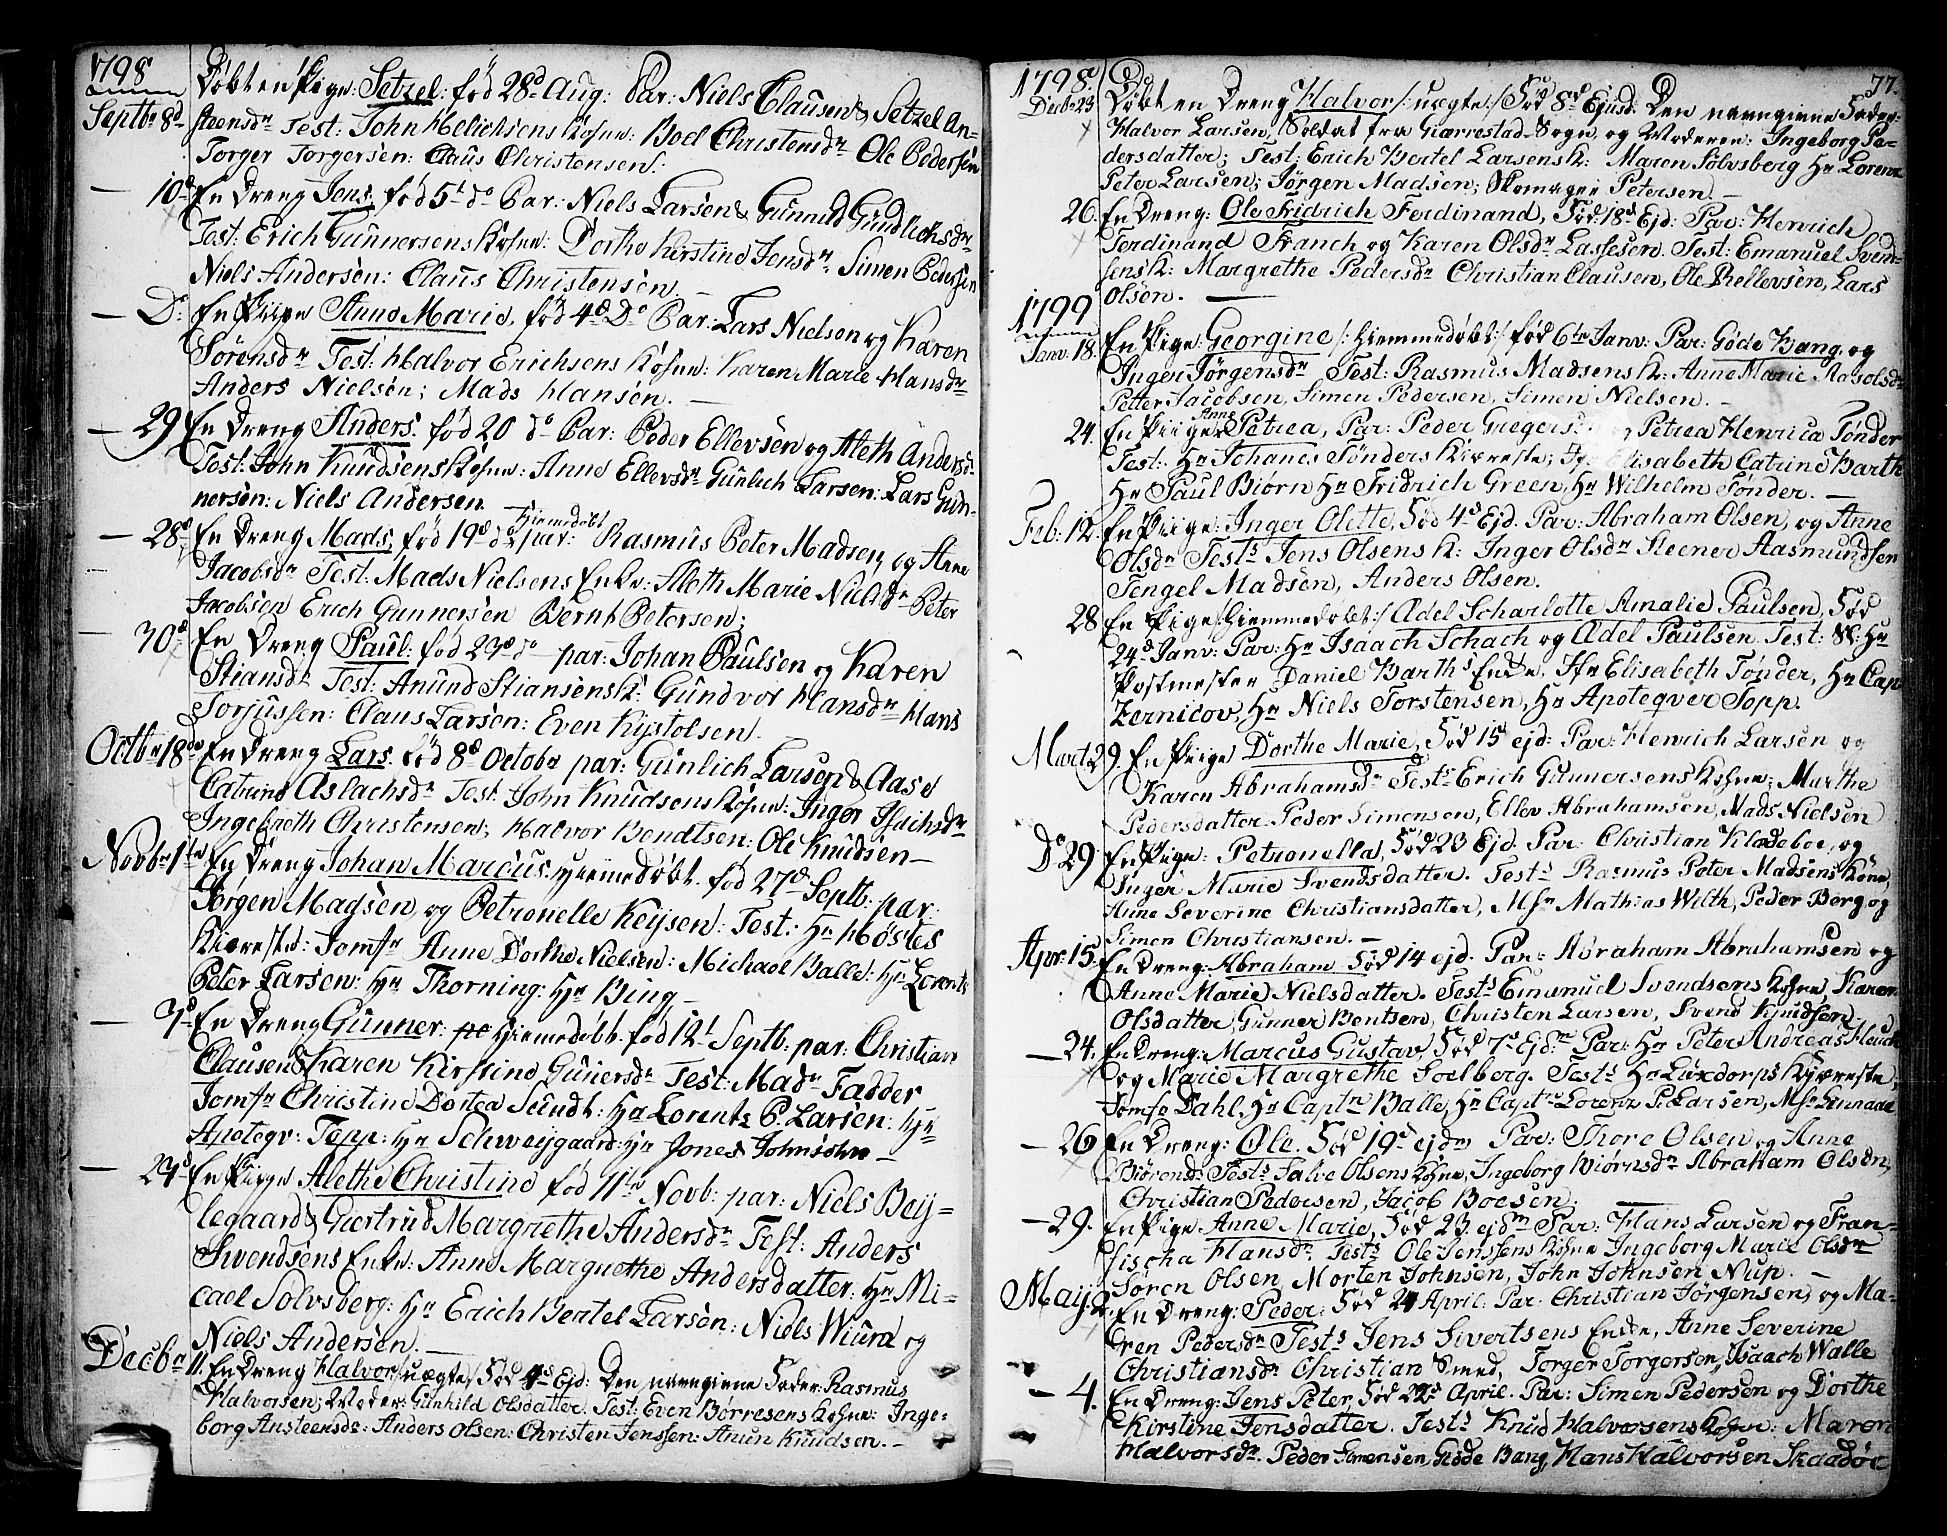 SAKO, Kragerø kirkebøker, F/Fa/L0002: Ministerialbok nr. 2, 1767-1802, s. 77